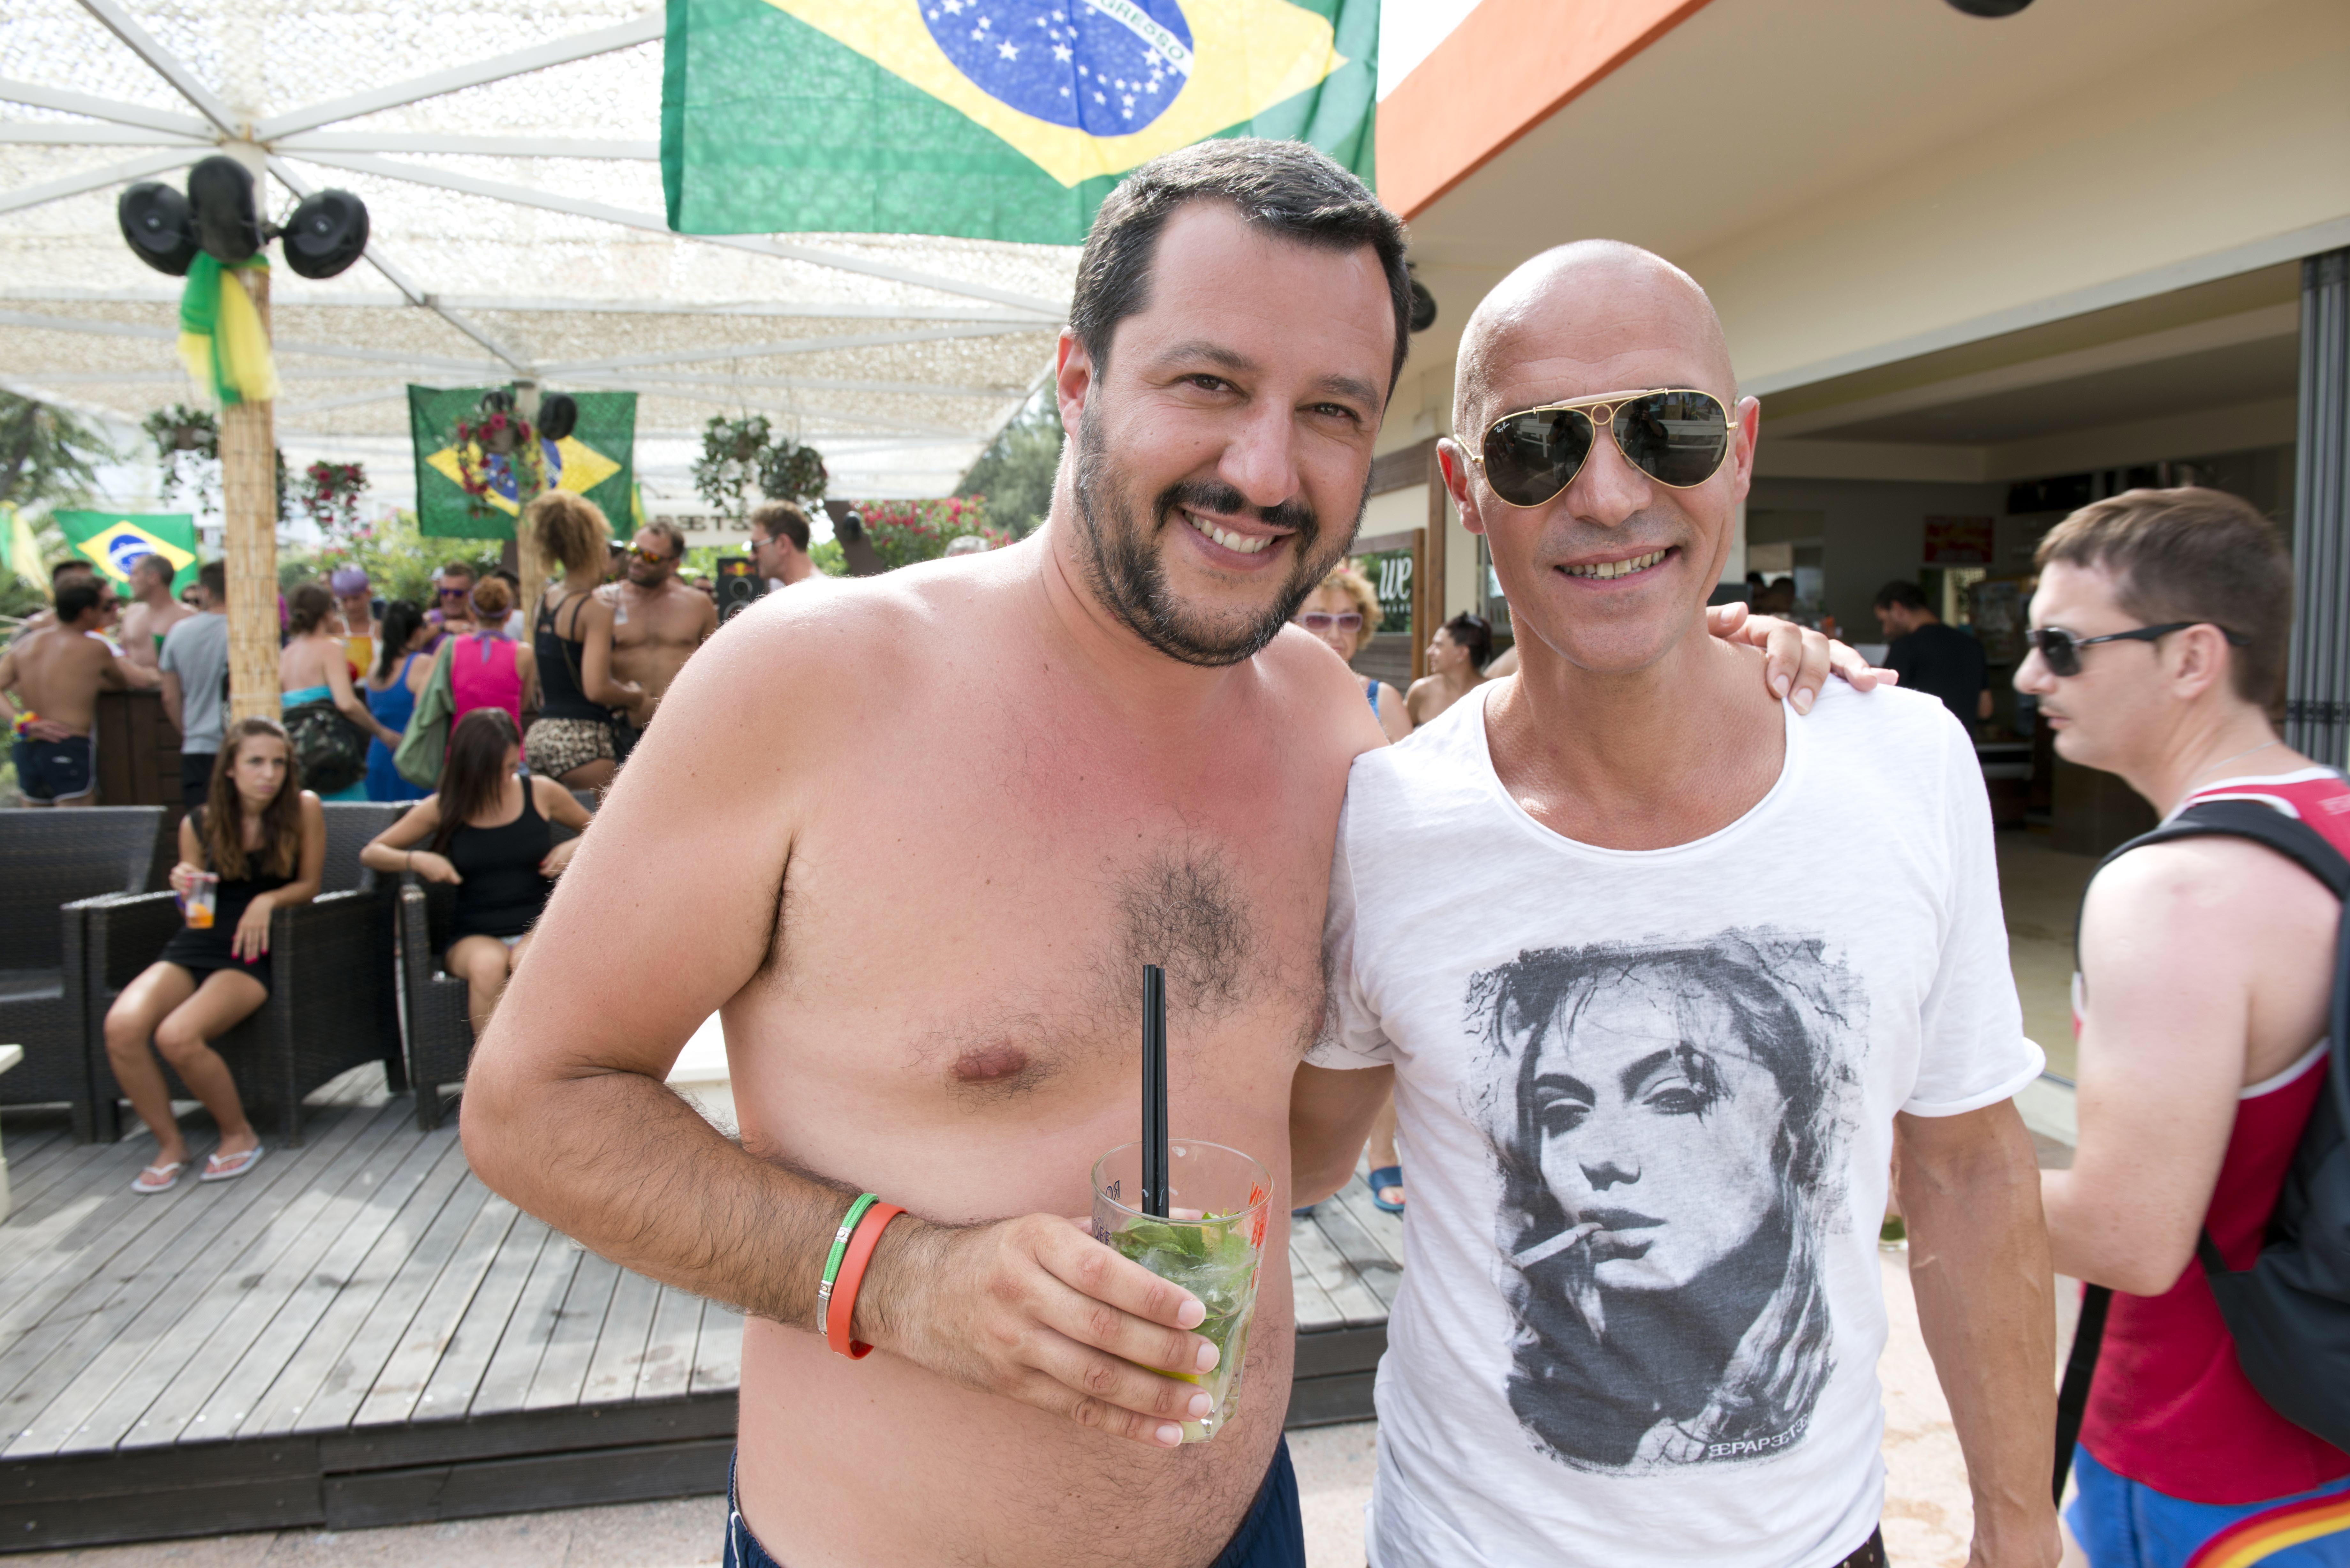 Matteo salvinii lega nord papeete Beach milano marittima